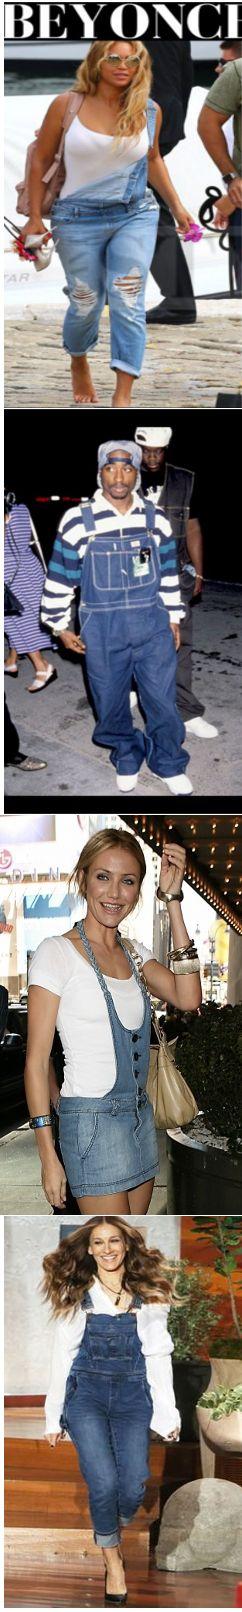 Jeans, Designer jeans, Jeans for women, Jeans for men, Dungarees, Celebrity jeans, smart jeans, blue jeans, black jeans, white jeans, ripped jeans ,  Low Rise Jeans, mid Rise Denims (Regular), Boyfriend Jeans, Straight/ Cigarette Jeans, Boot Cut Jeans, Flare Jeans, Wide Leg Jeans, Skinny Leg Jeans, Loose jeans, relaxed jeans, cropped jeans, cuffed jeans, printed jeans, coloured jeans www.conciergeservice.today